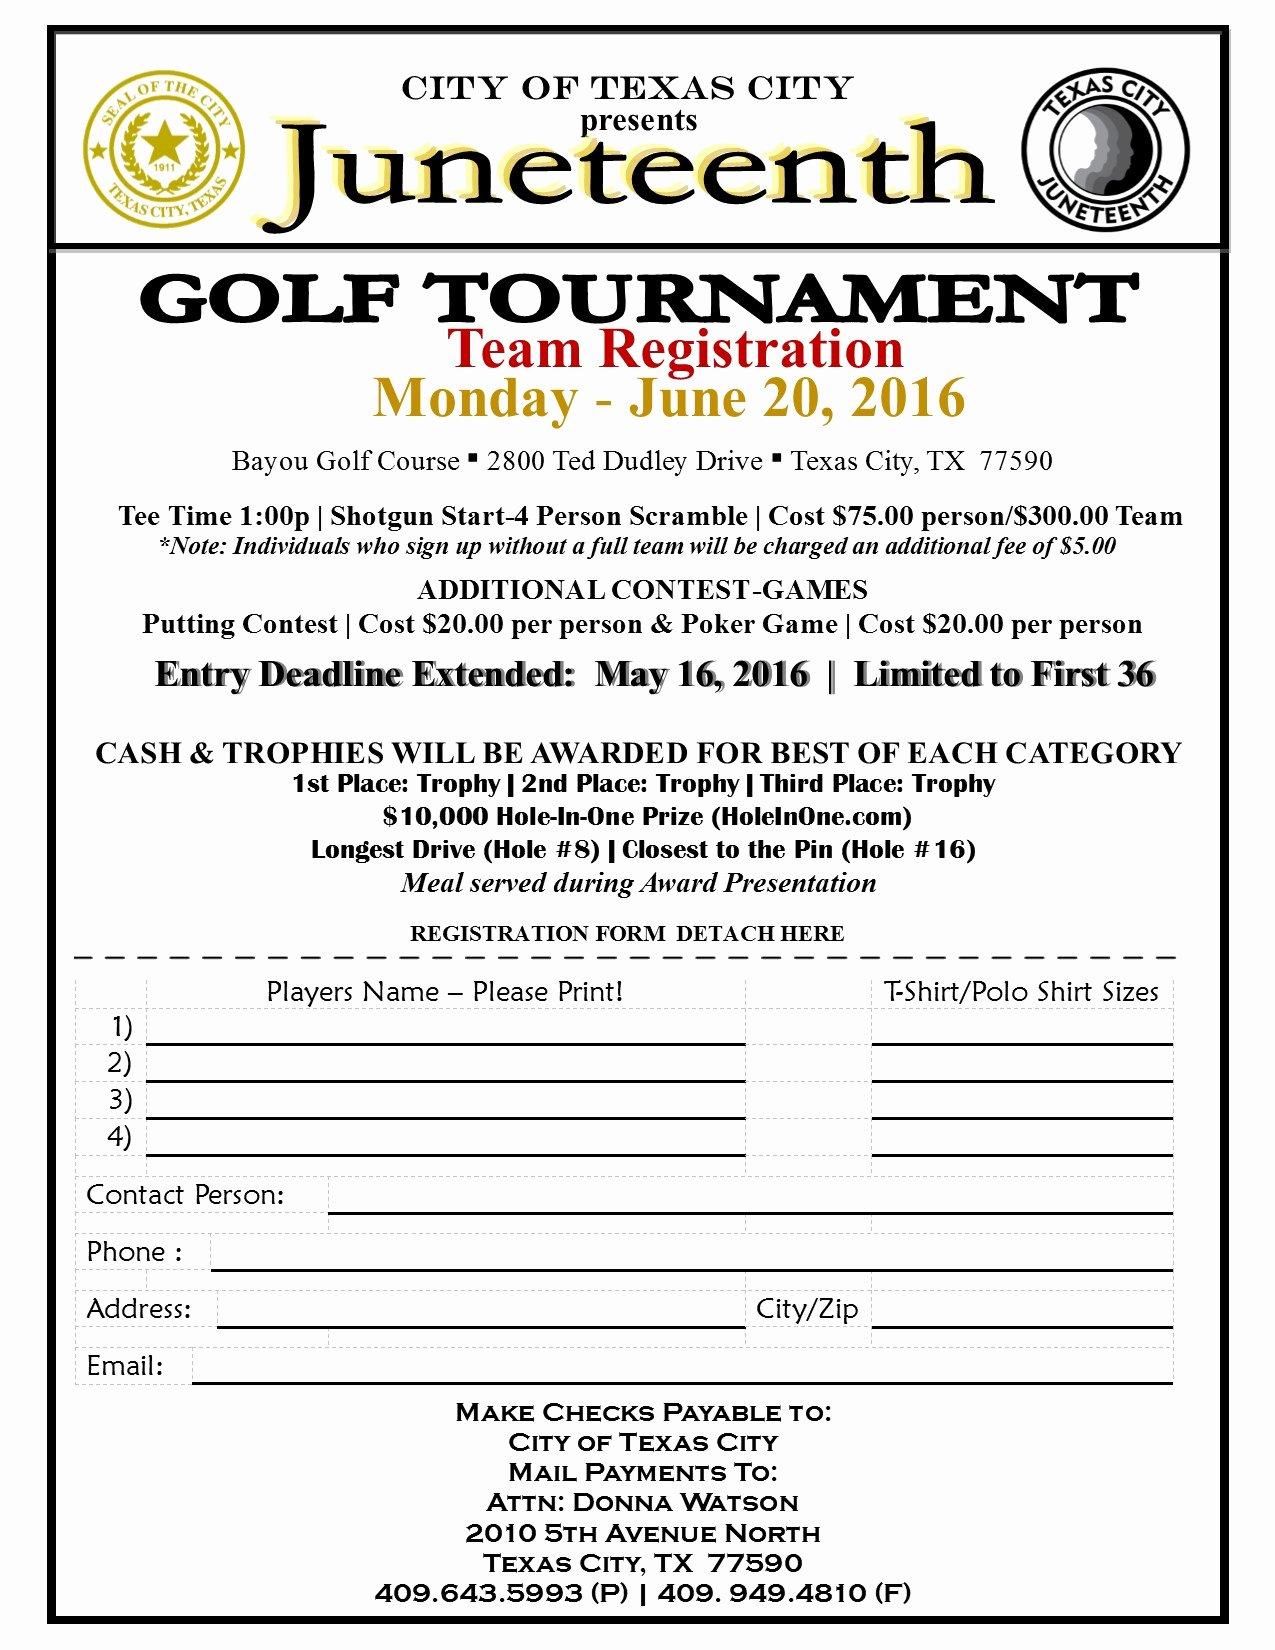 Golf tournament Entry forms Template New Juneteenth Golf tournament 2016